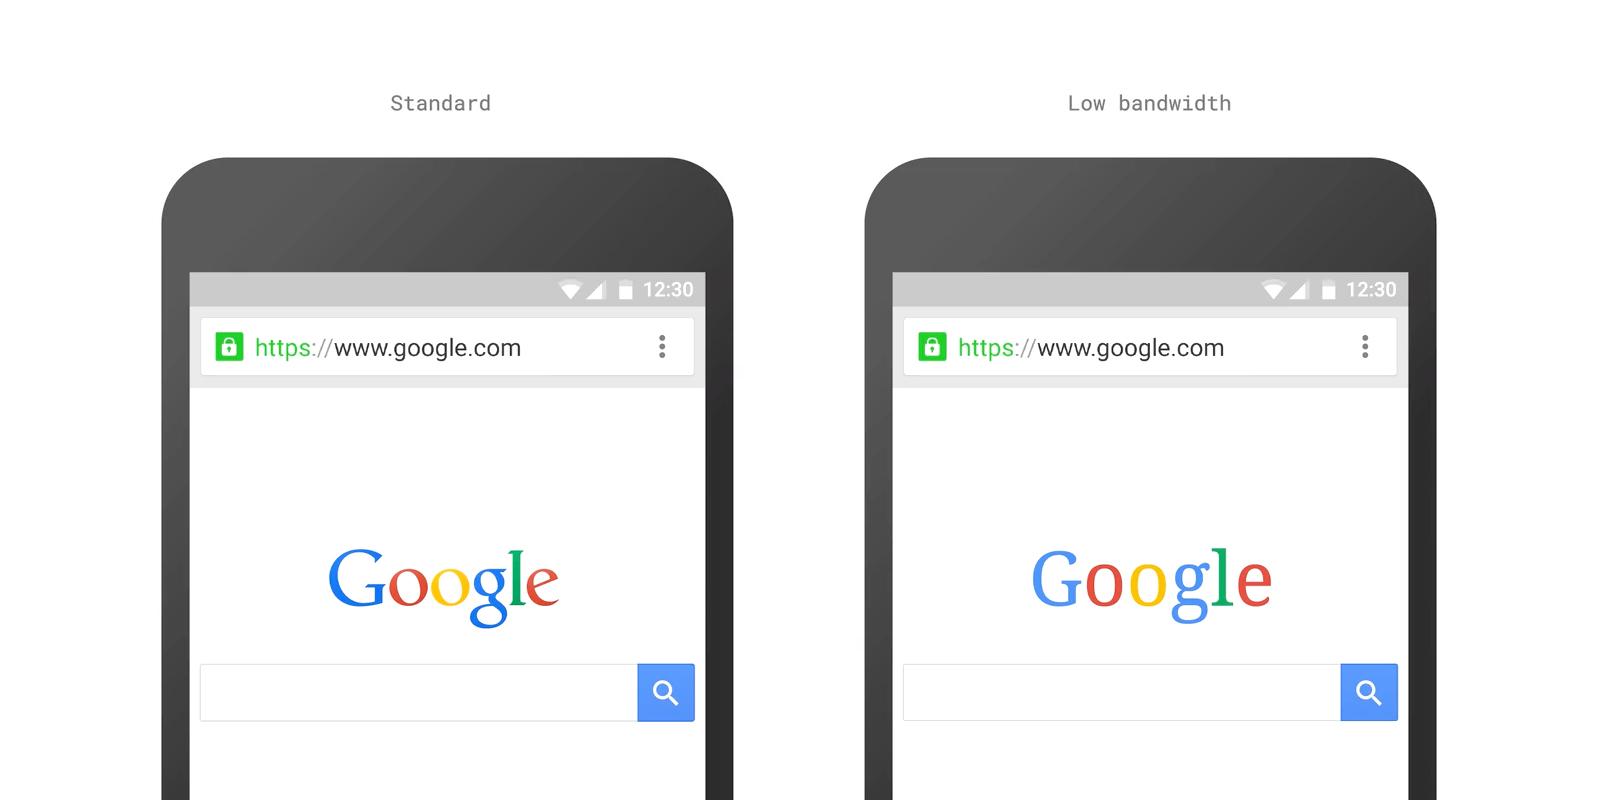 Google_low_bandwidth_full